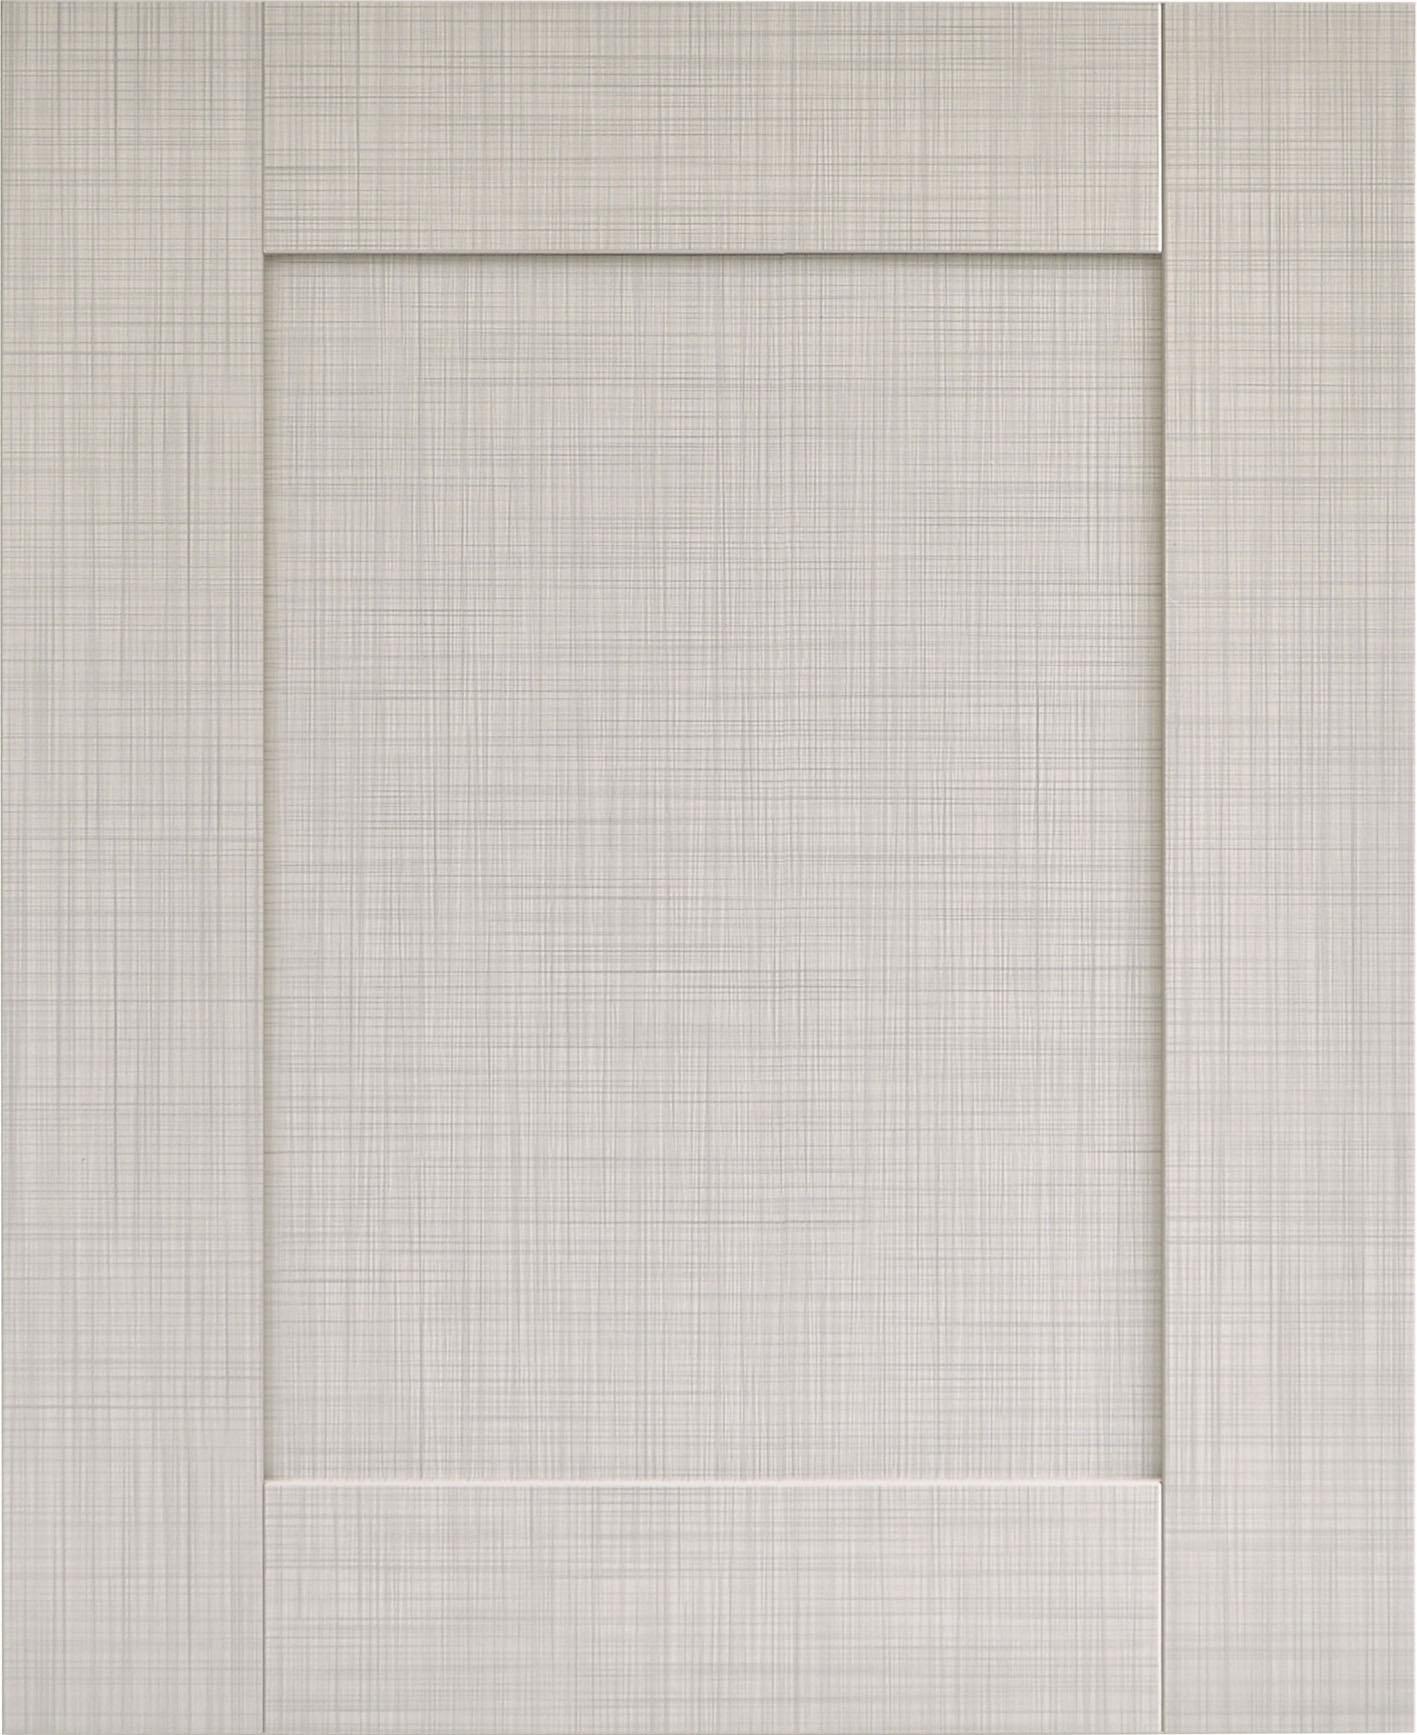 Square Frame 549-SQ